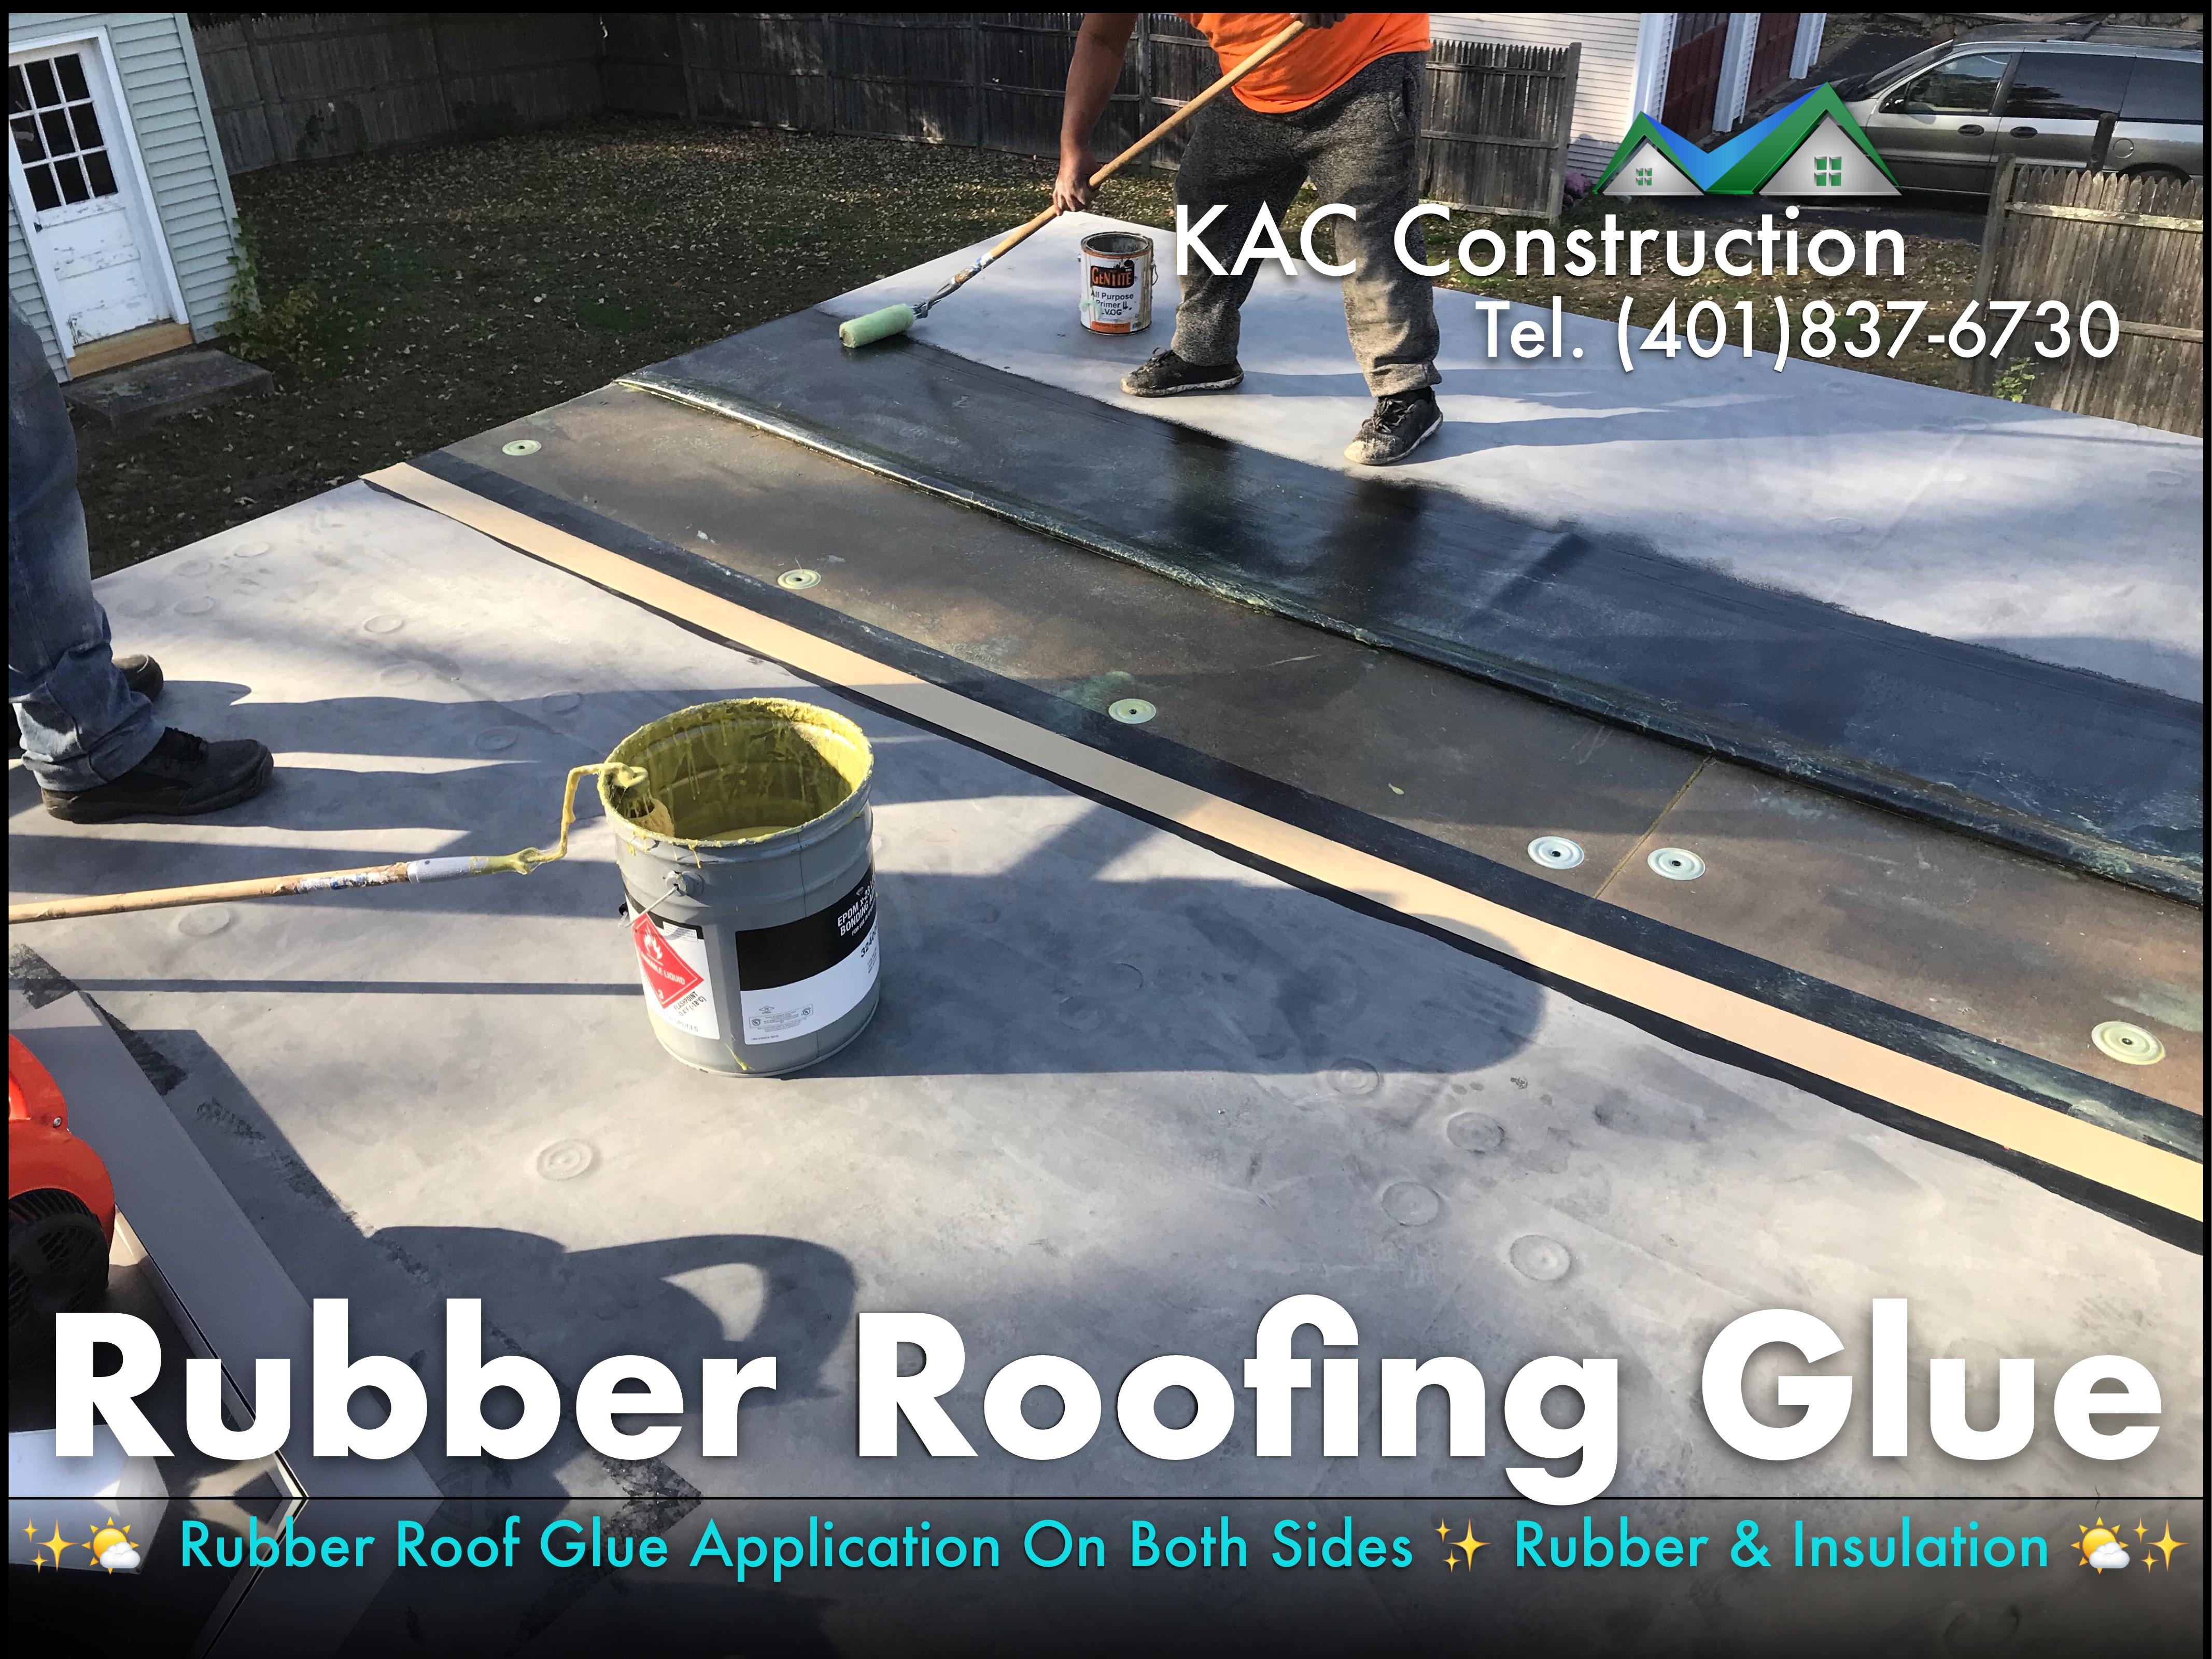 Rubber roof repair, rubber roof repair ri, rubber roof repair in RI, rubber roof repairs in RI, rubber roof contractor, rubber roof contractor ri, rubber roof contractor in RI, rubber roof Installation ri,